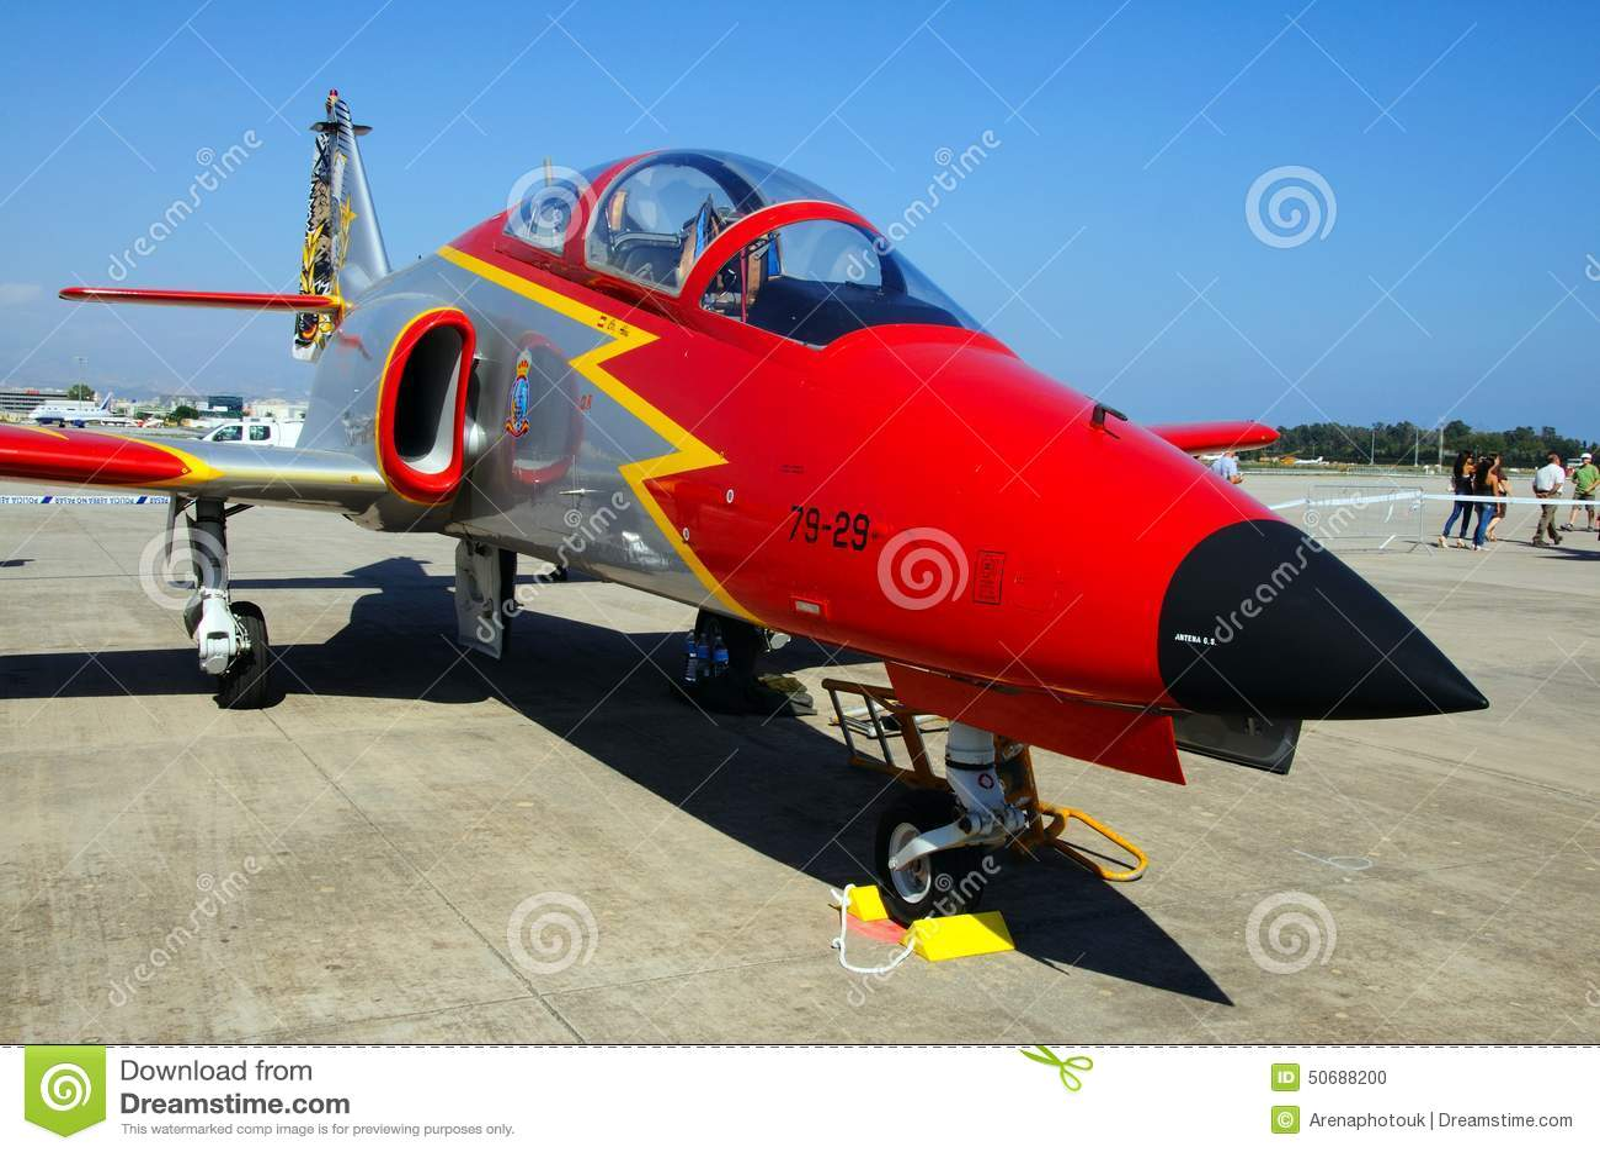 Download 住处C-101 Aviojet 编辑类图片. 图片 包括有 西班牙语, 红色, 军事, 显示, 通信工具 - 50688200